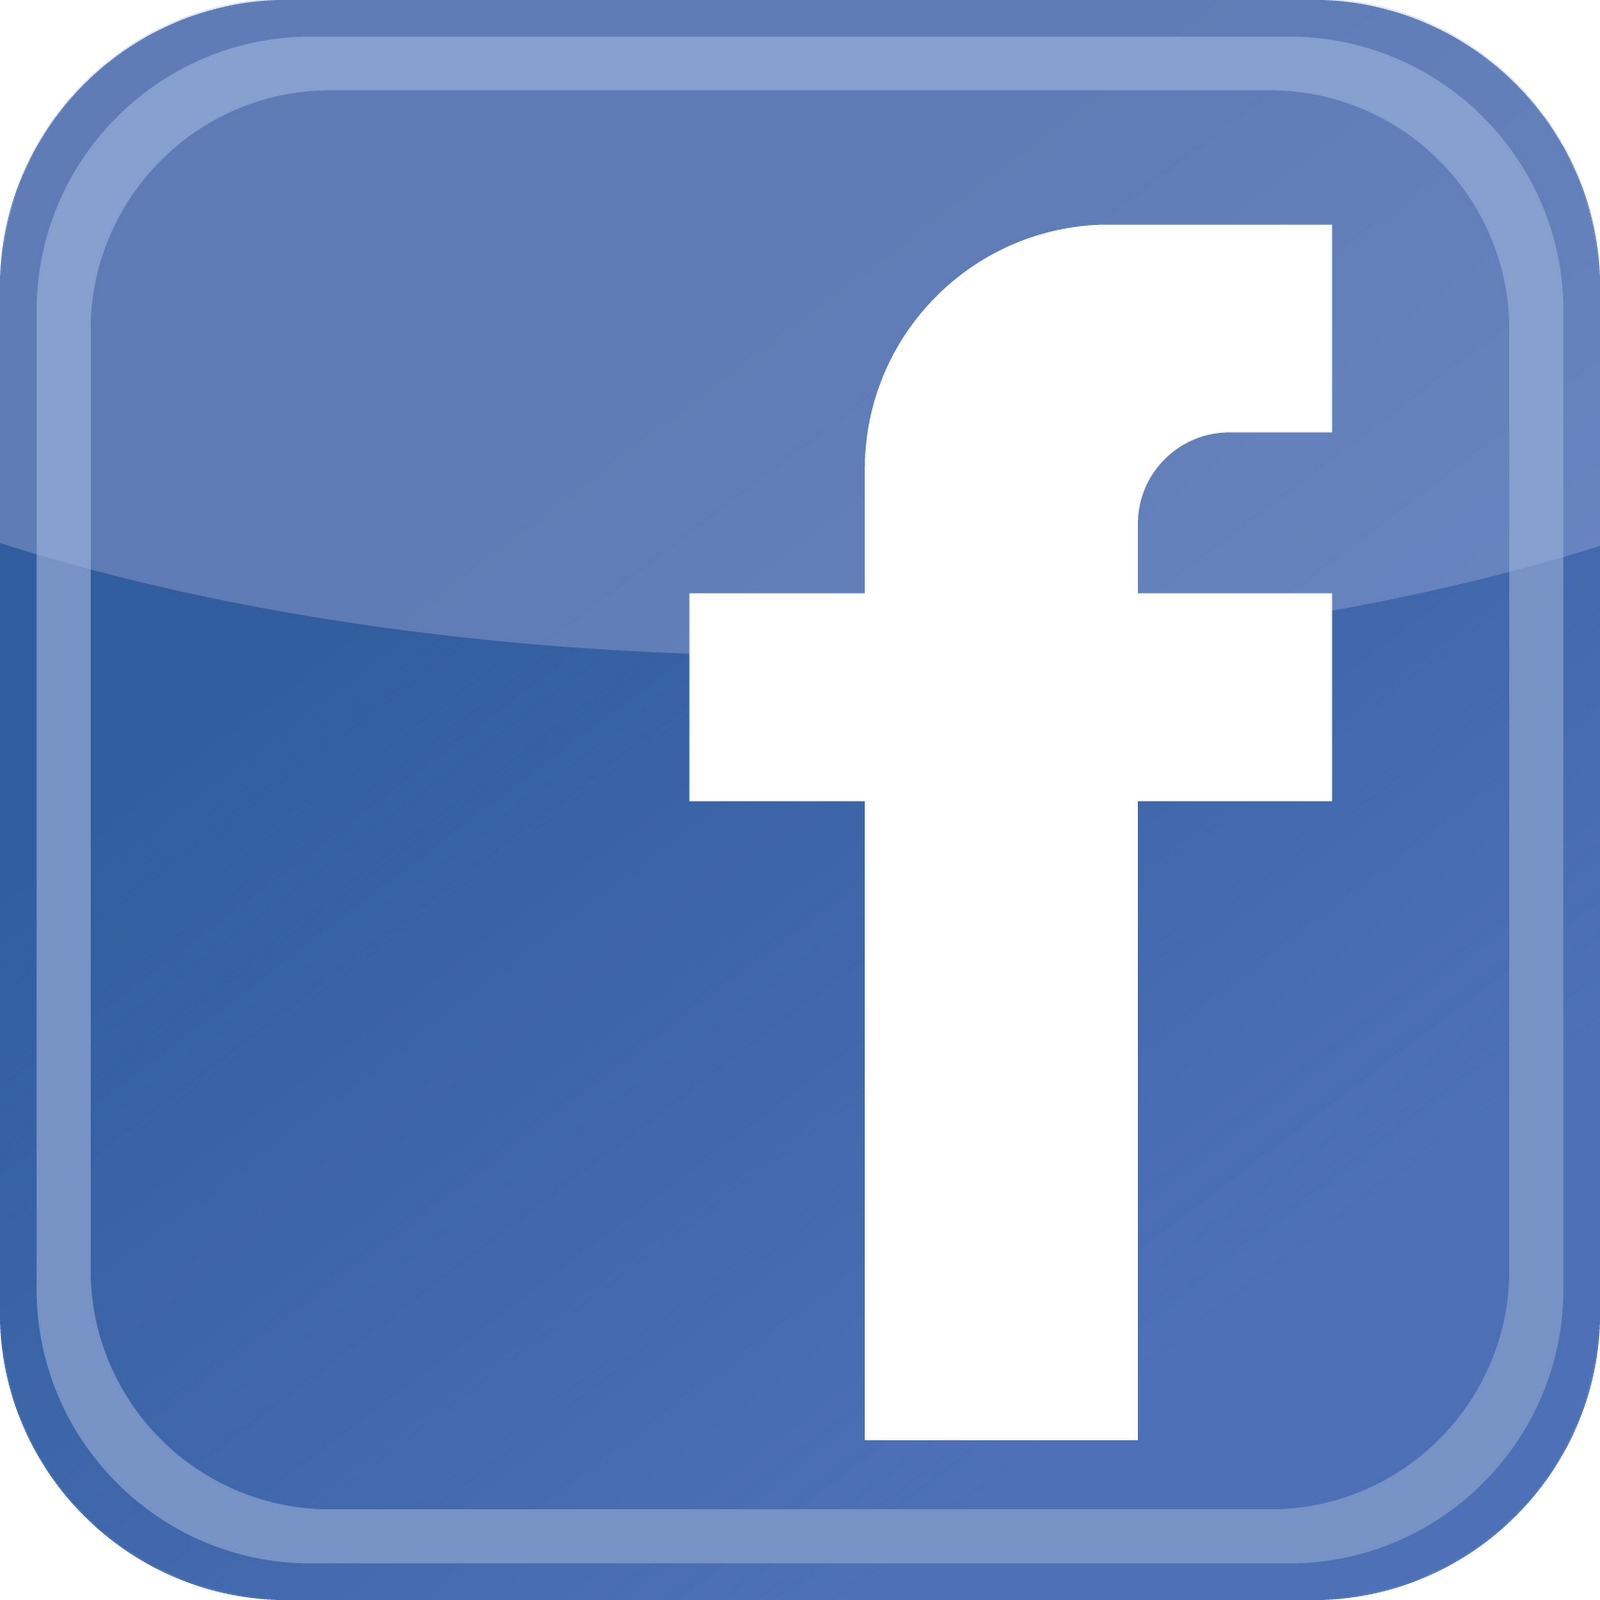 Facebook_Png_01